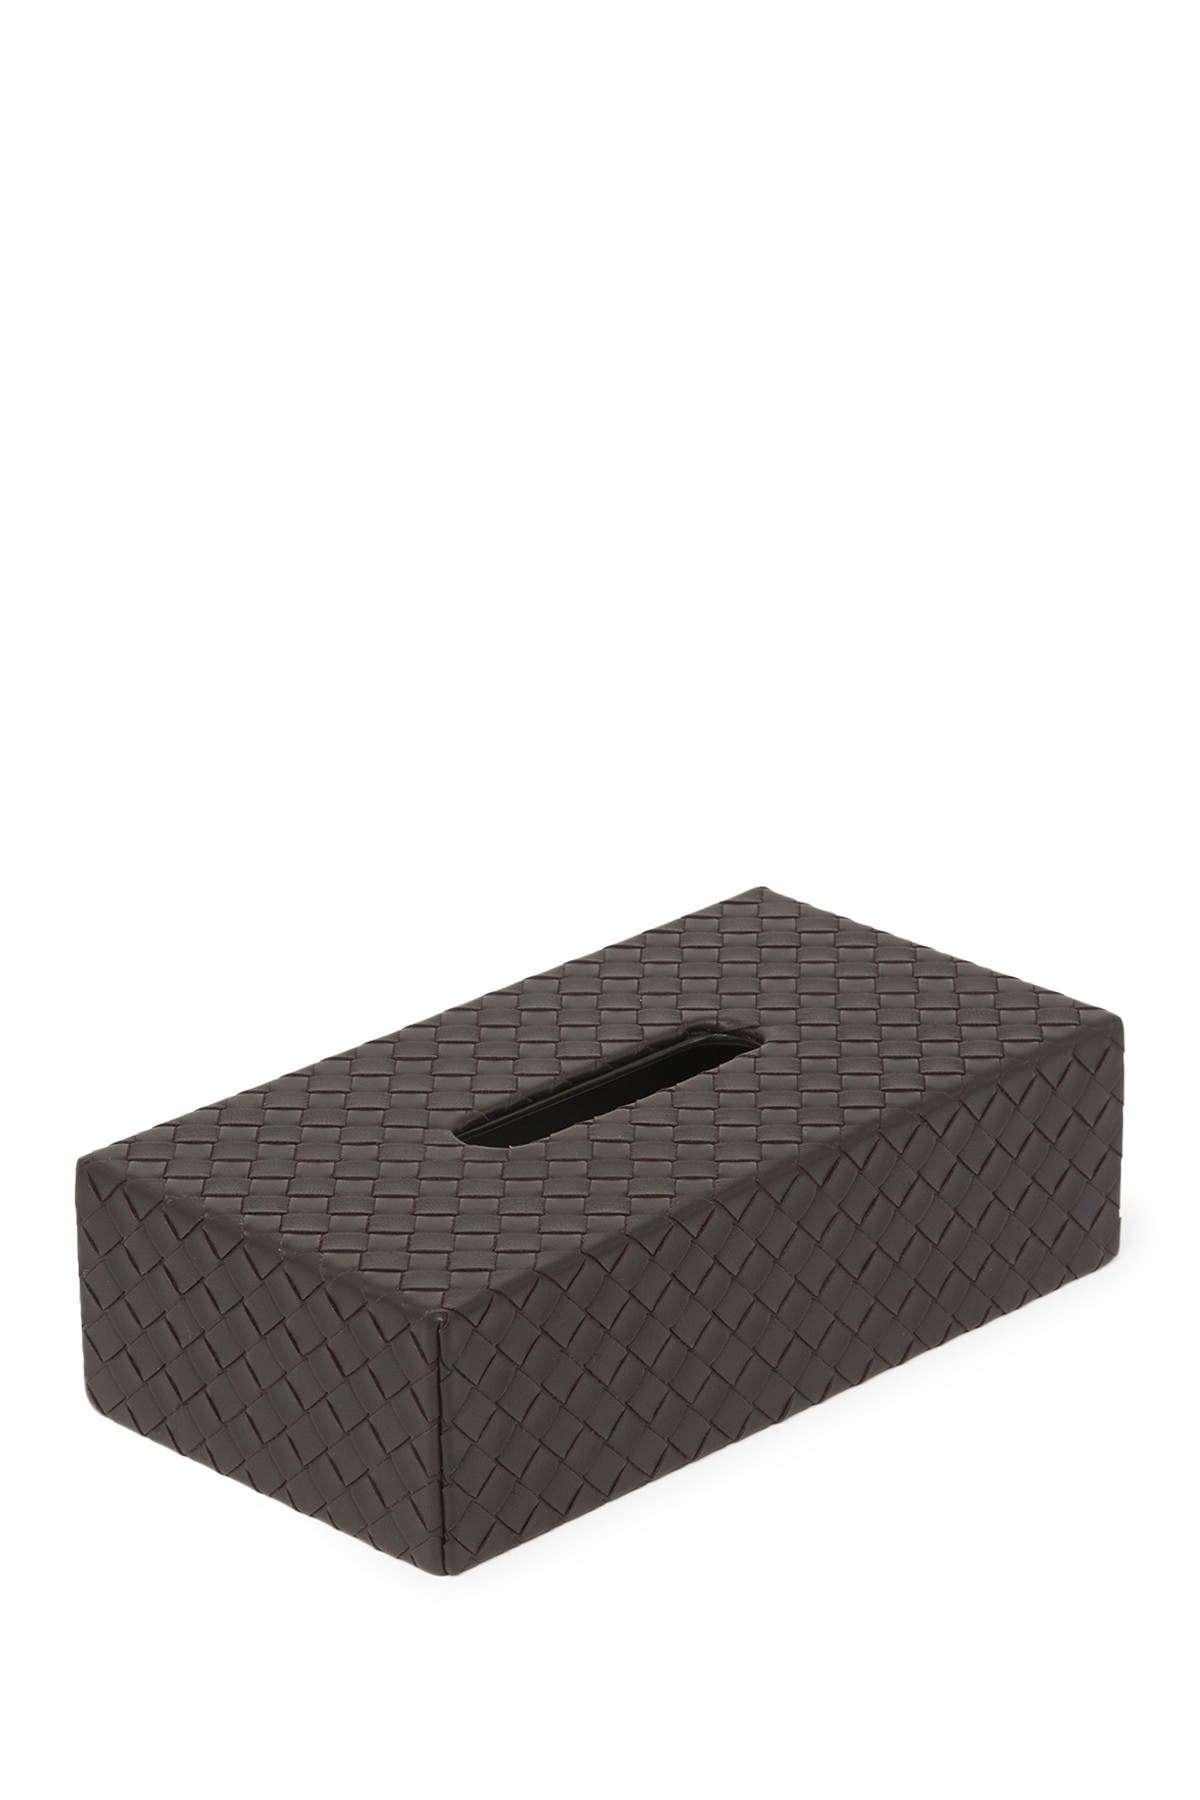 Image of Bottega Veneta Leather Weave Tissue Box Holder